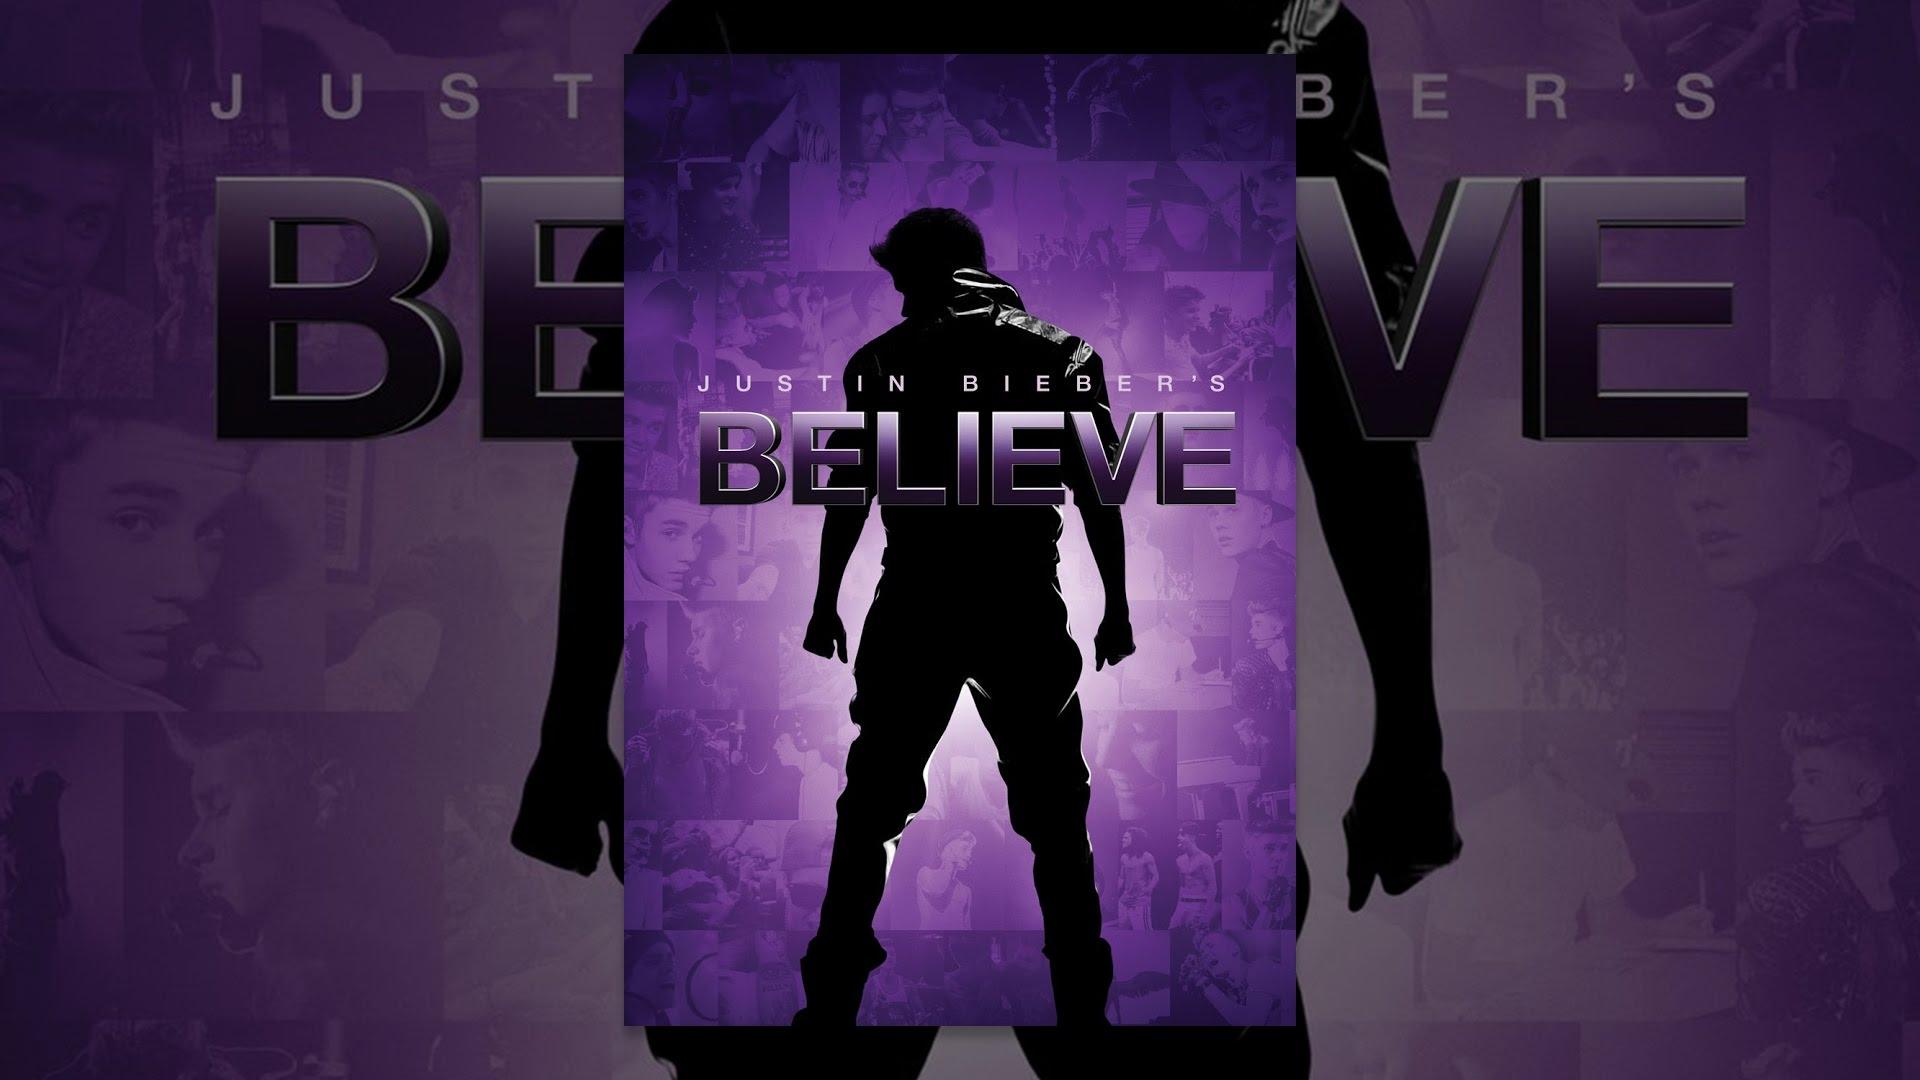 Justin Bieber - Justin Bieber's Believe